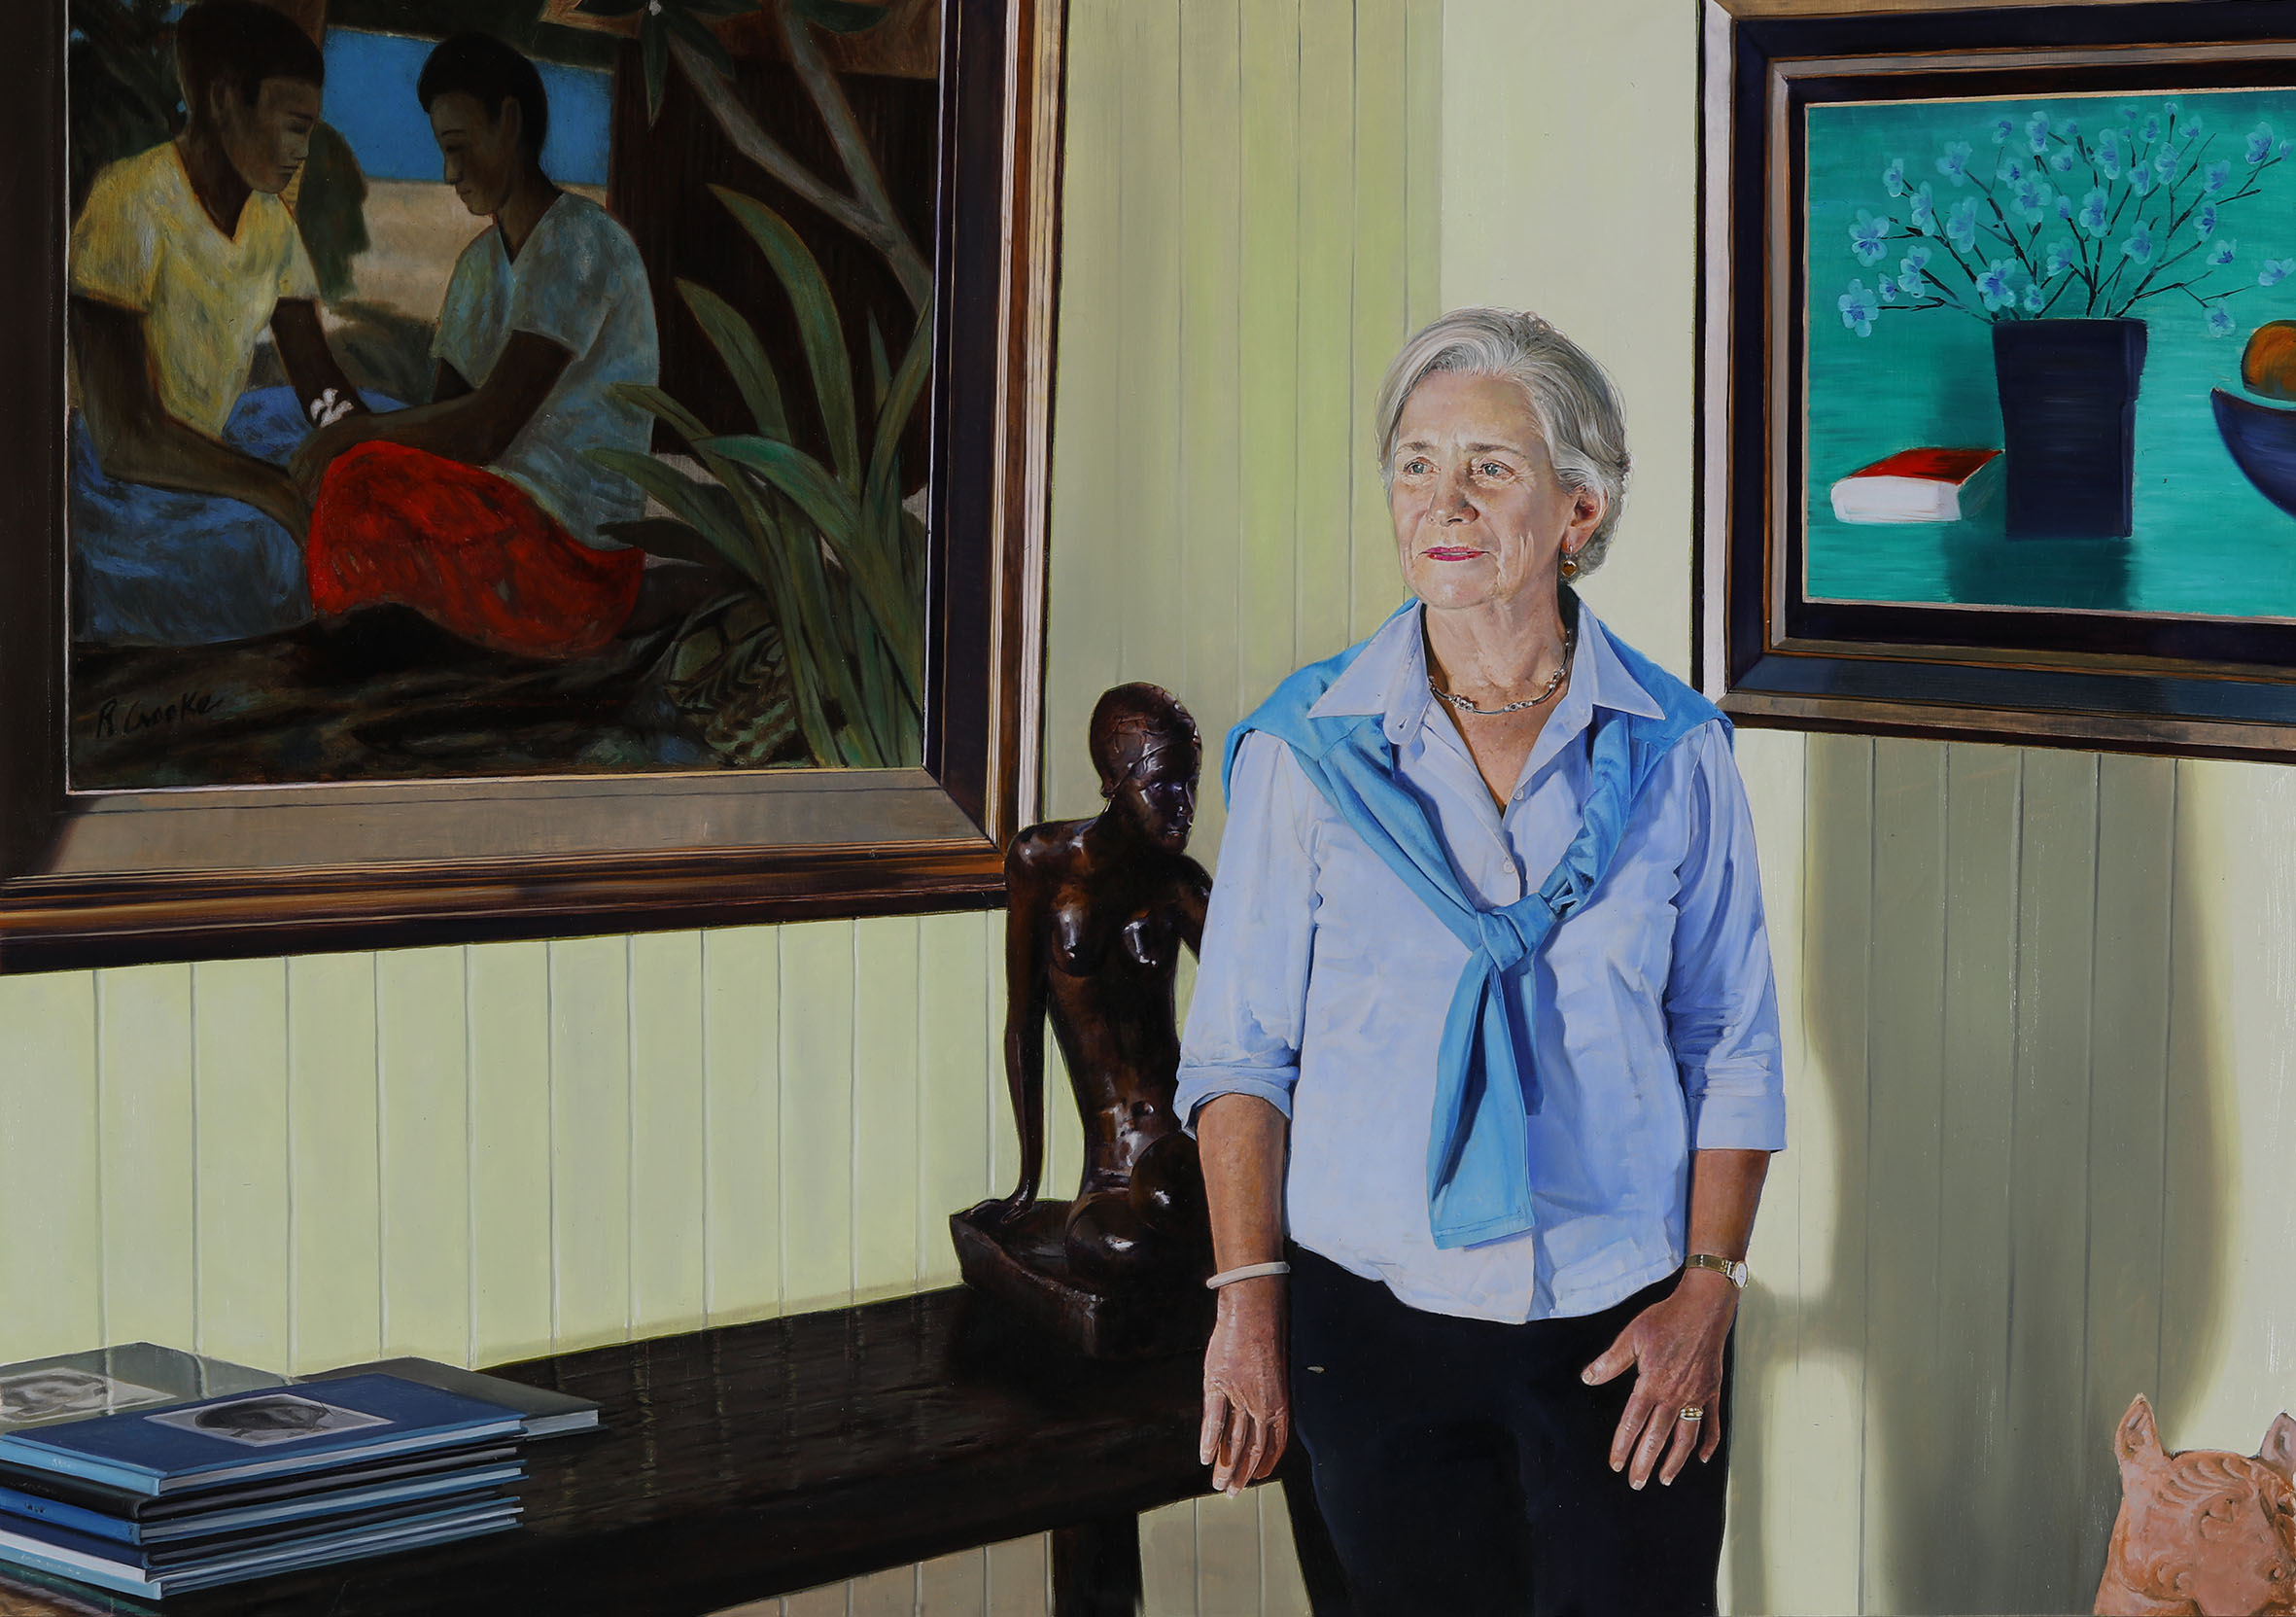 Gina at home by Michael Zavros